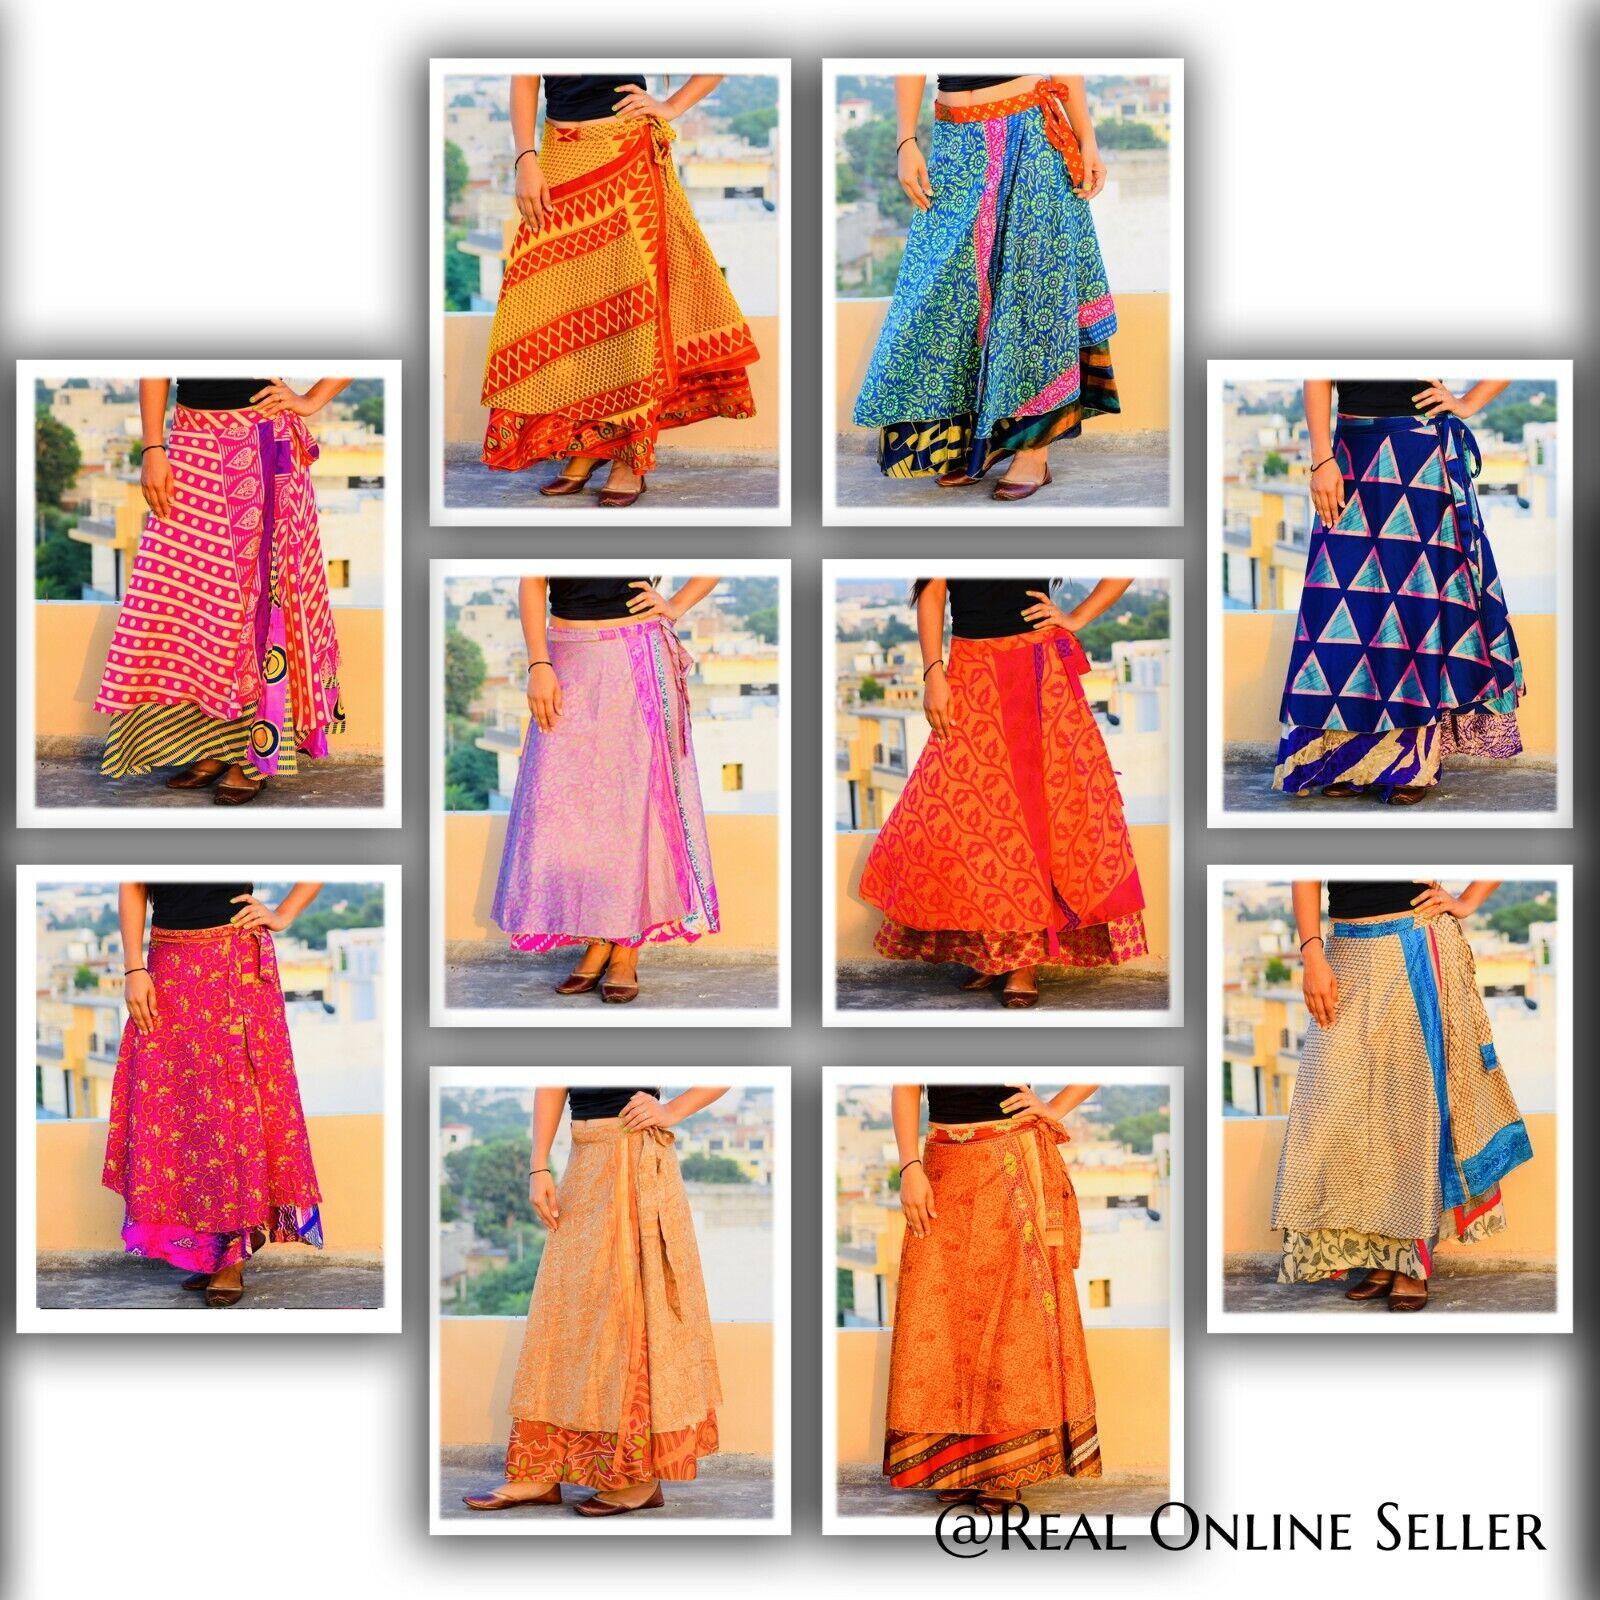 10 Stück Mix Rock Menge Vintage Indian Seide Sari Magic Wickel Röcke Beachwear